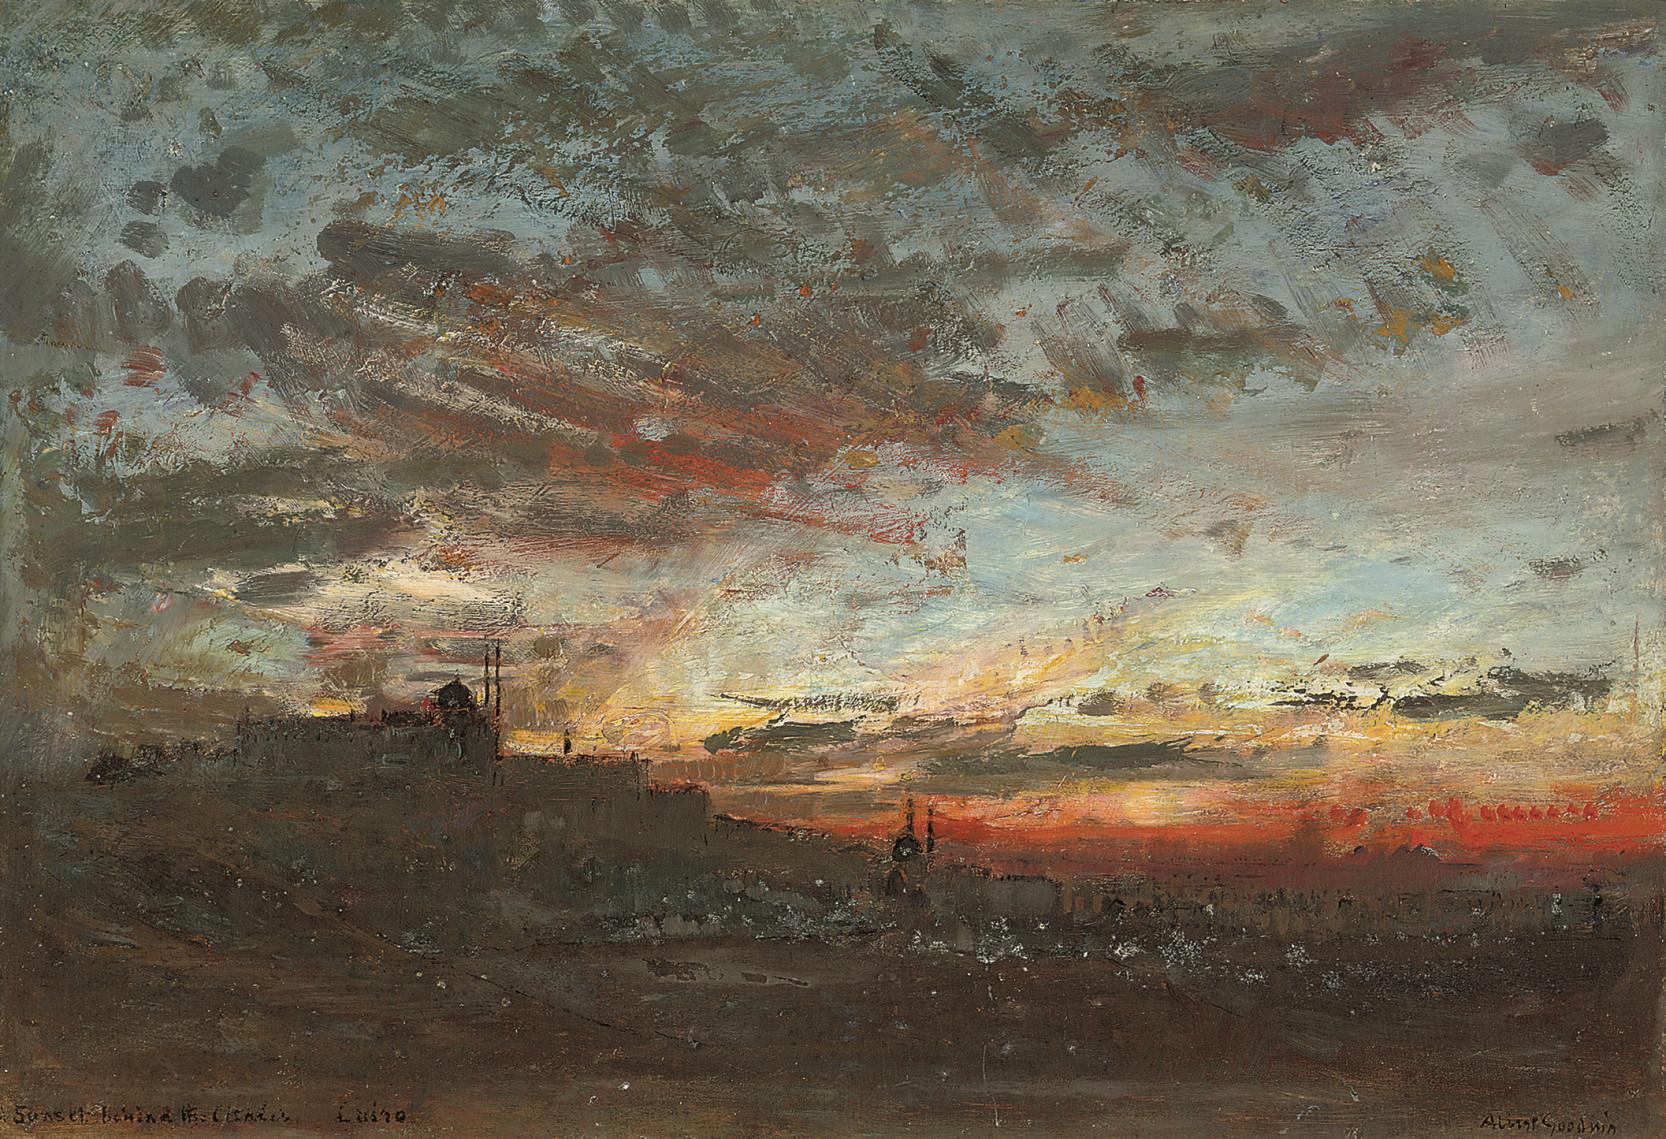 Albert Goodwin (British, 1845-